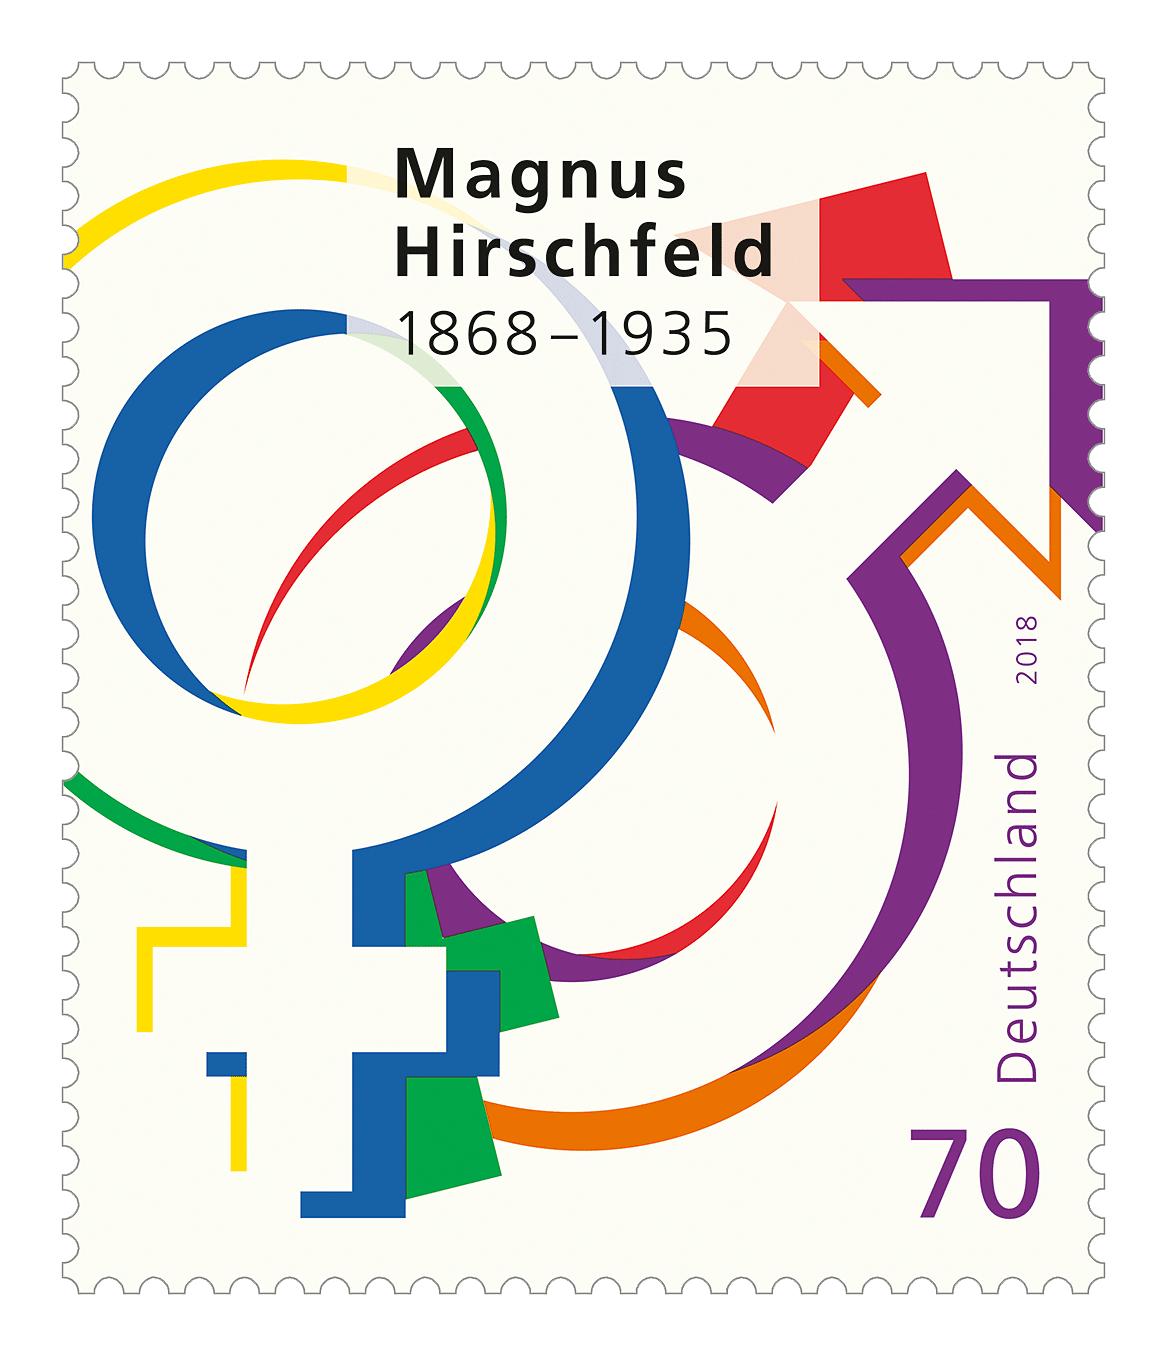 https://www.borek.de/briefmarke-150-geburtstag-magnus-hirschfeld